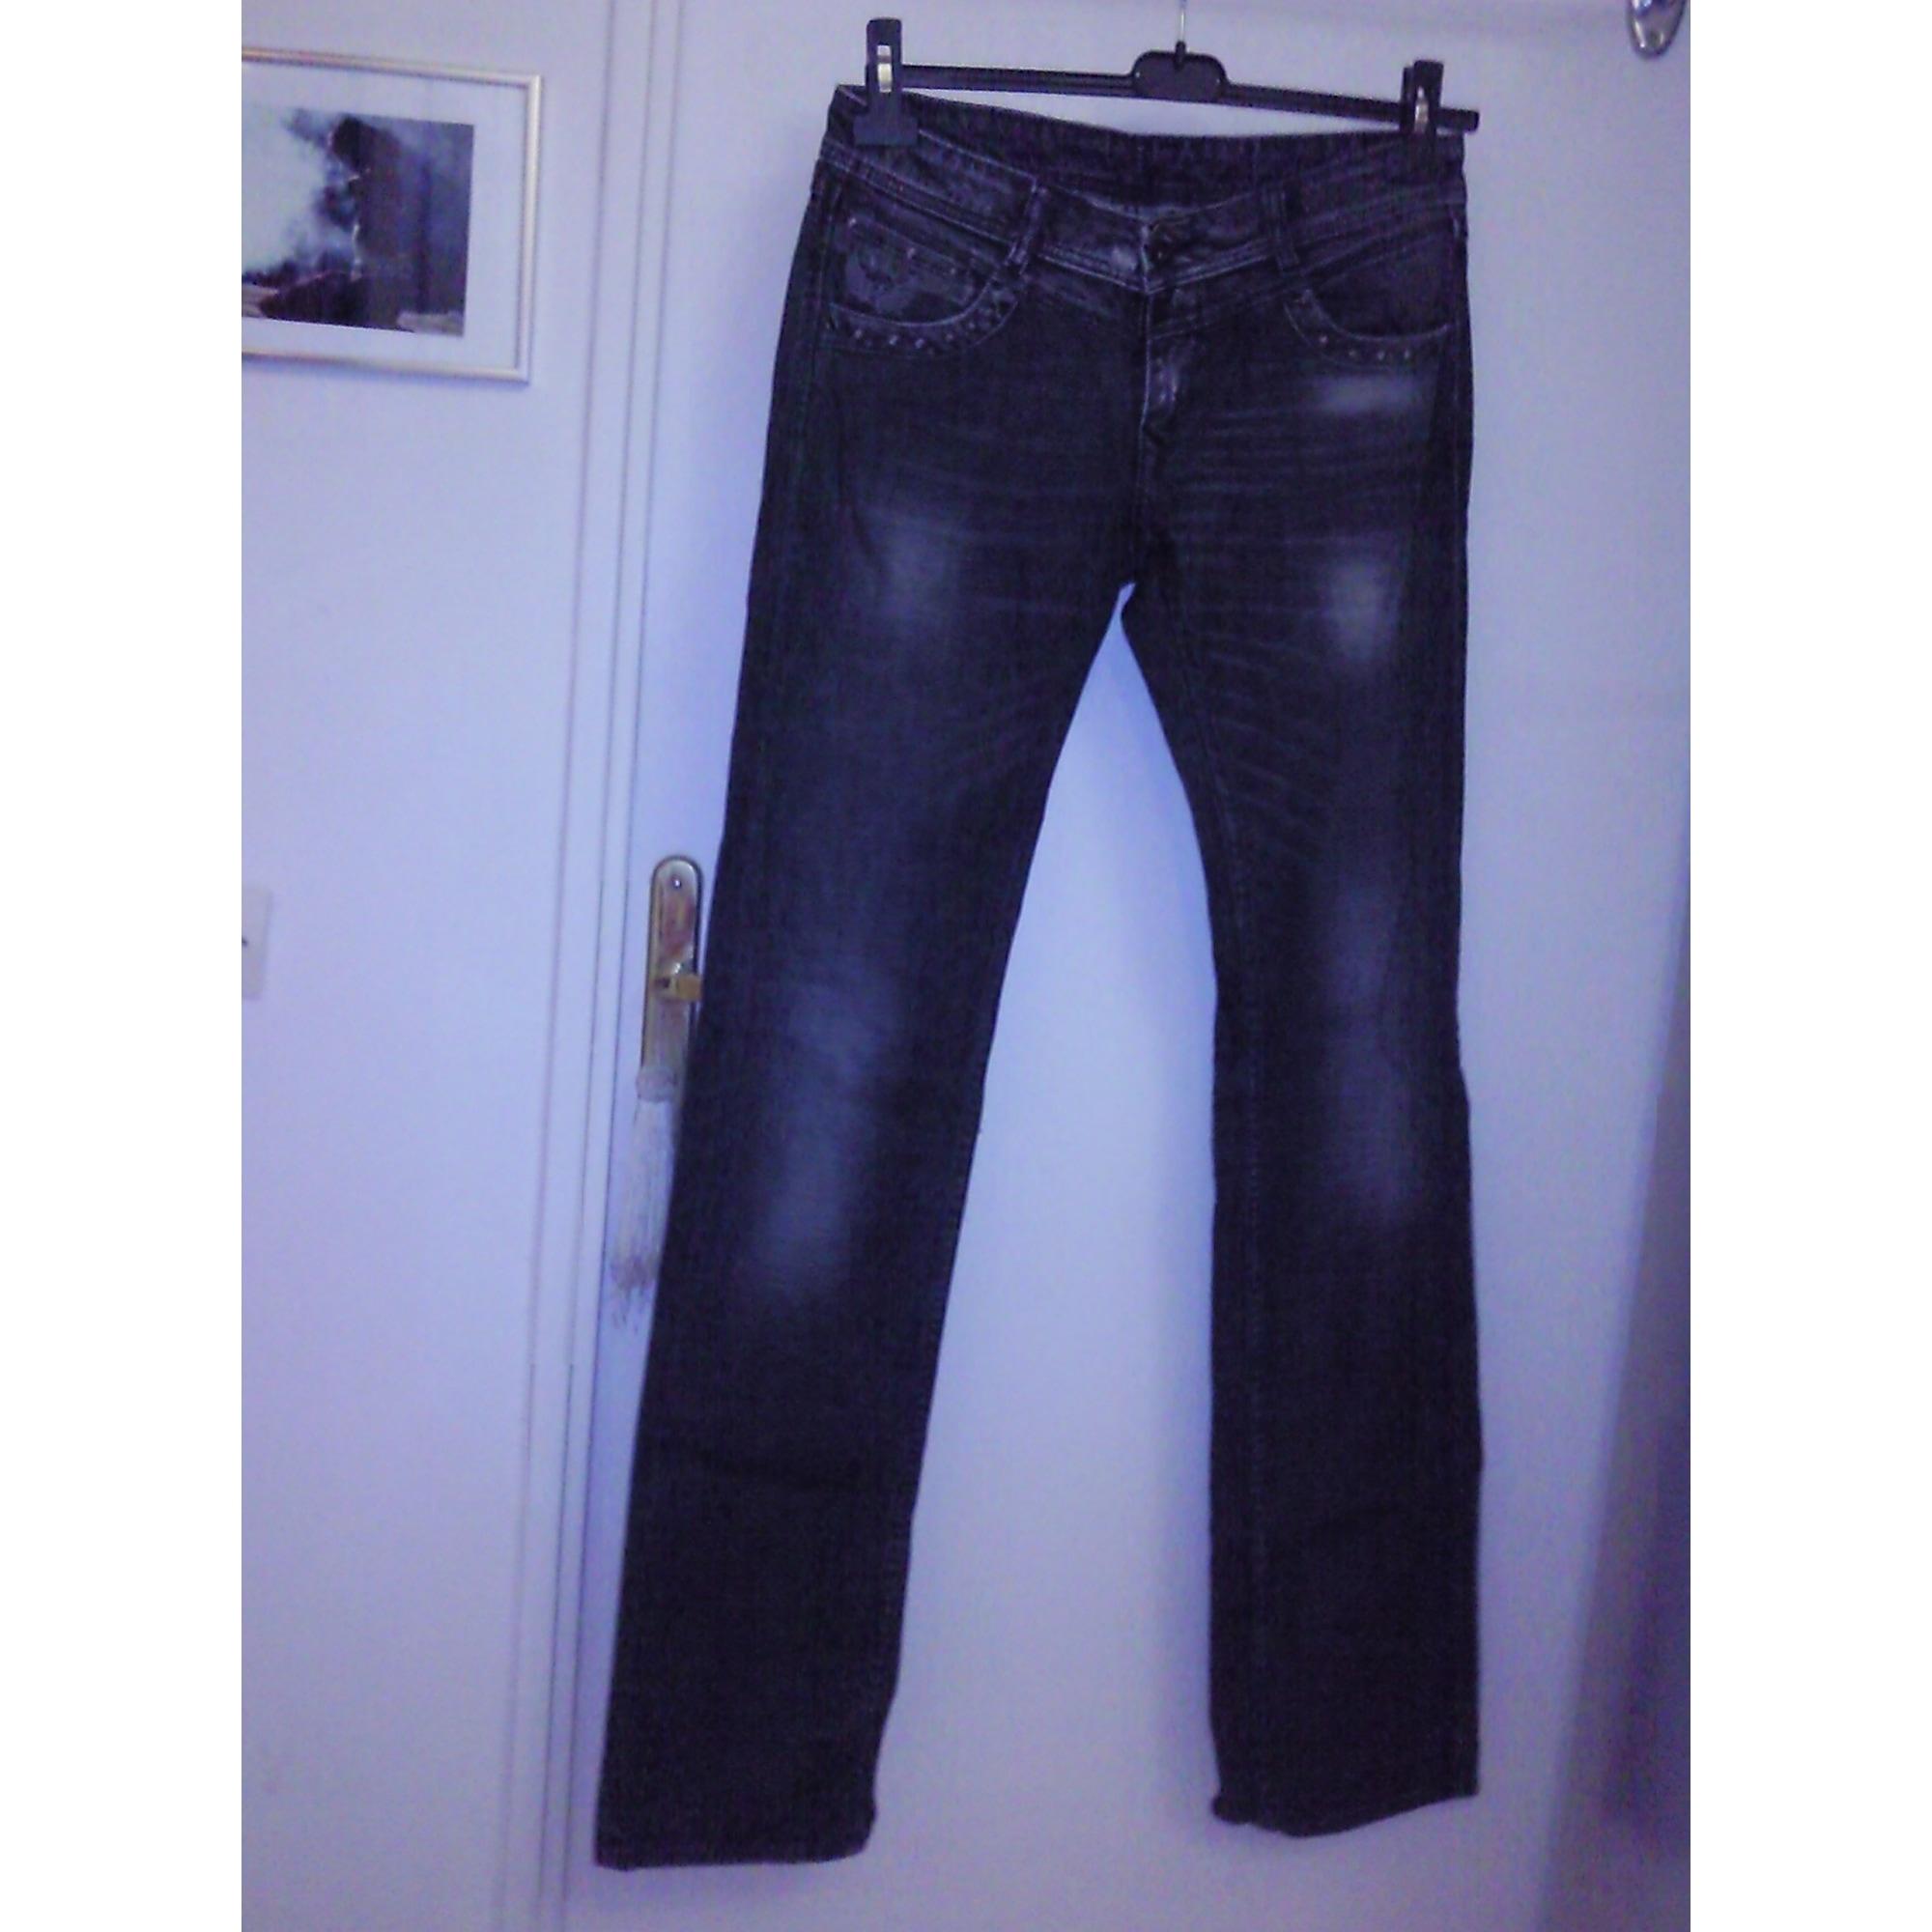 Jeans large, boyfriend KAPORAL W30 (T 40) gris - 2489143 a11aecda92e